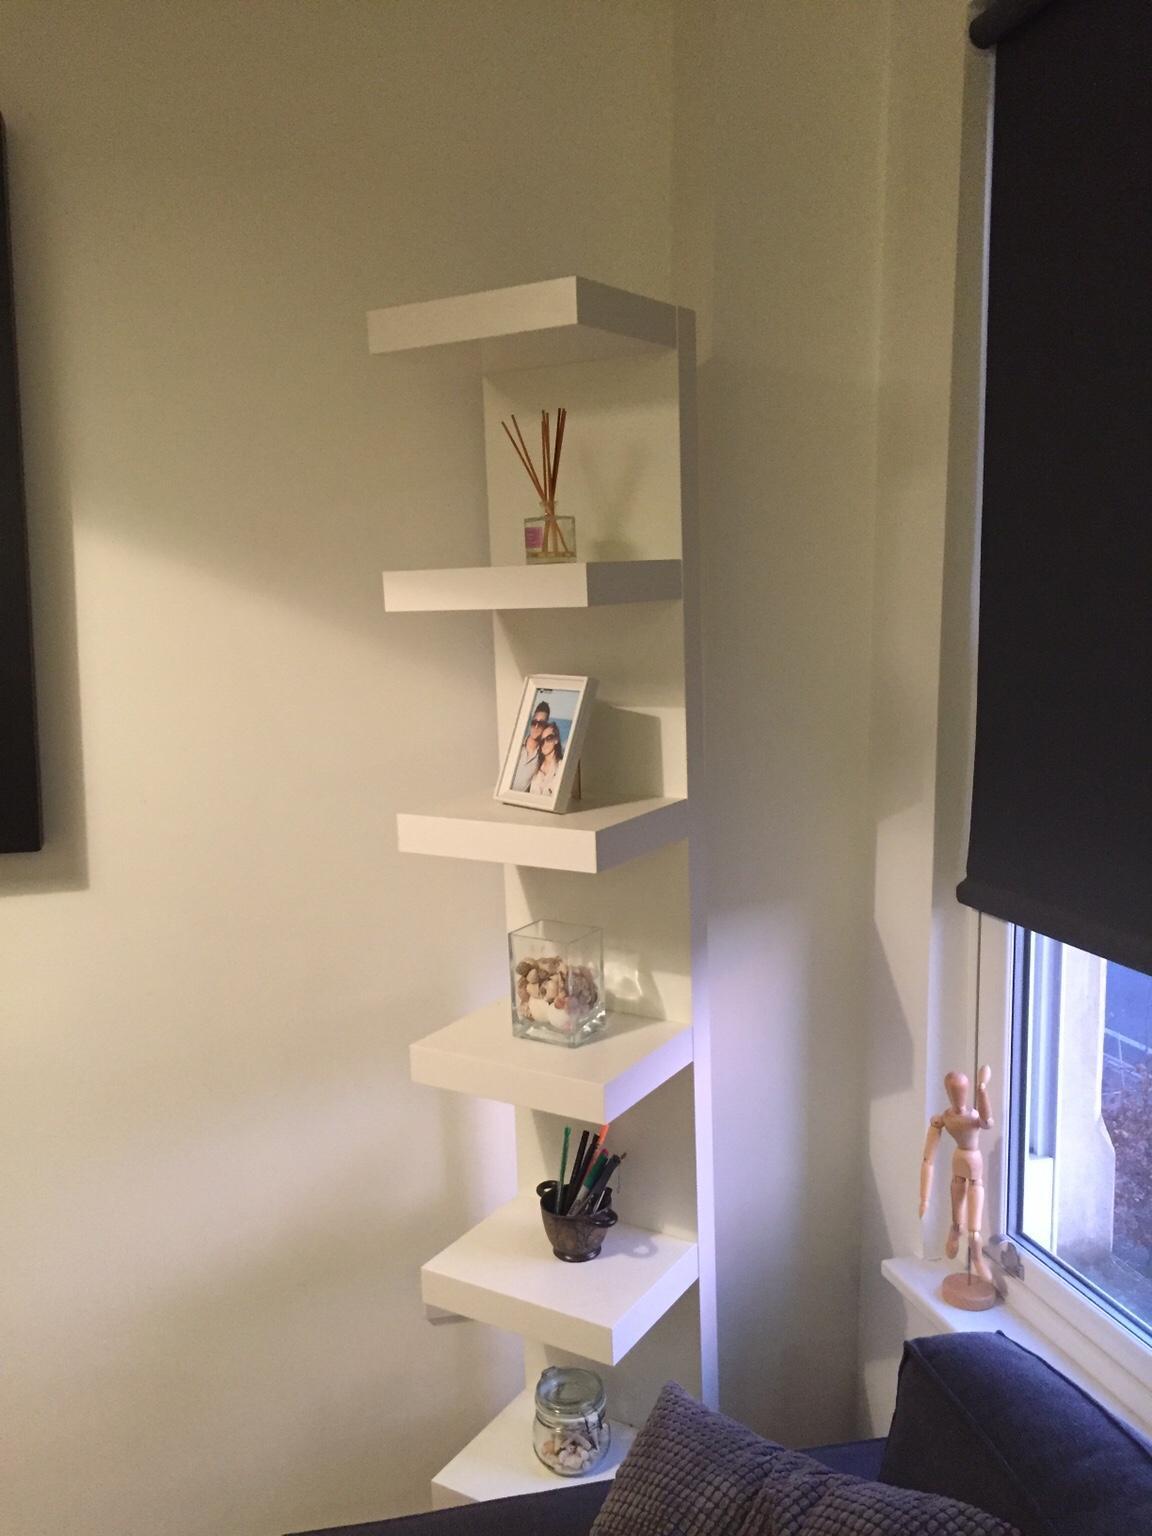 Ikea Lack Wall Shelf Unit White